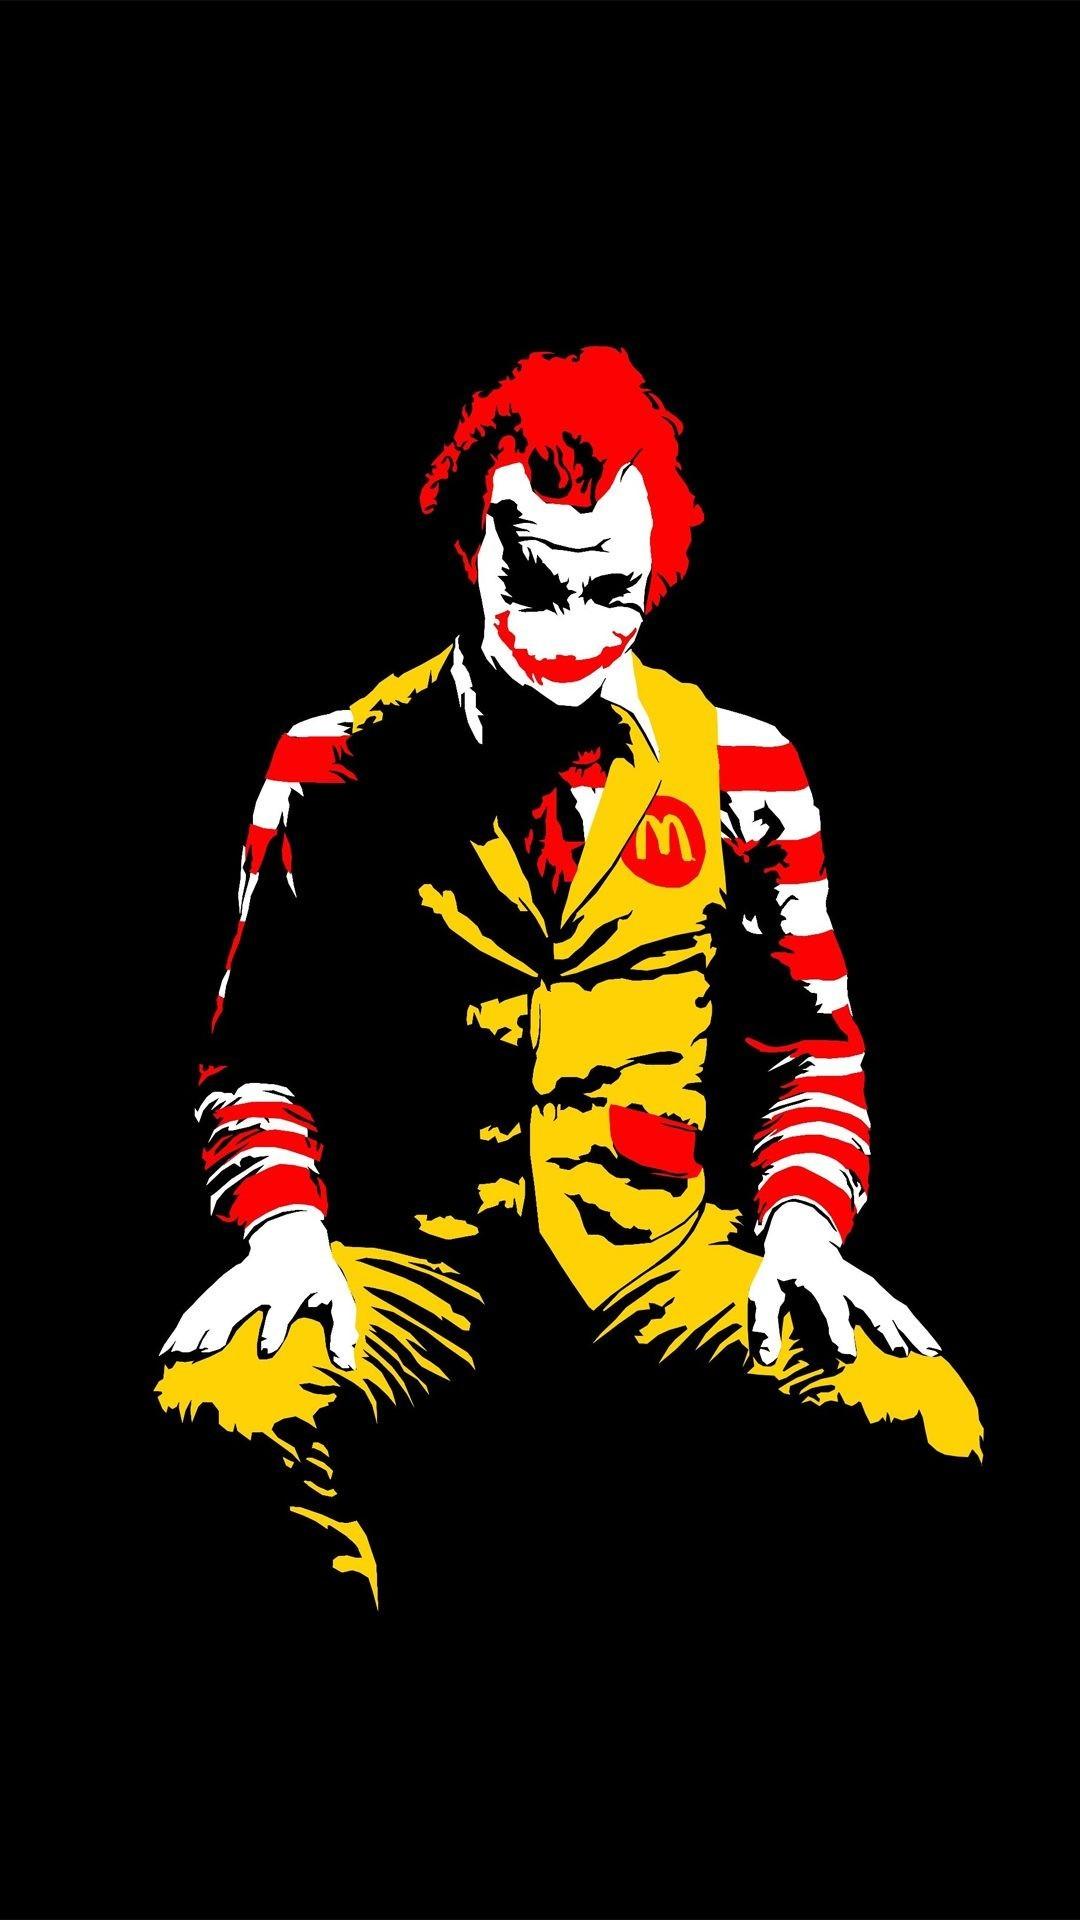 Joker iPhone 6 Plus Wallpapers – joker, th iPhone 6 Plus Wallpapers .